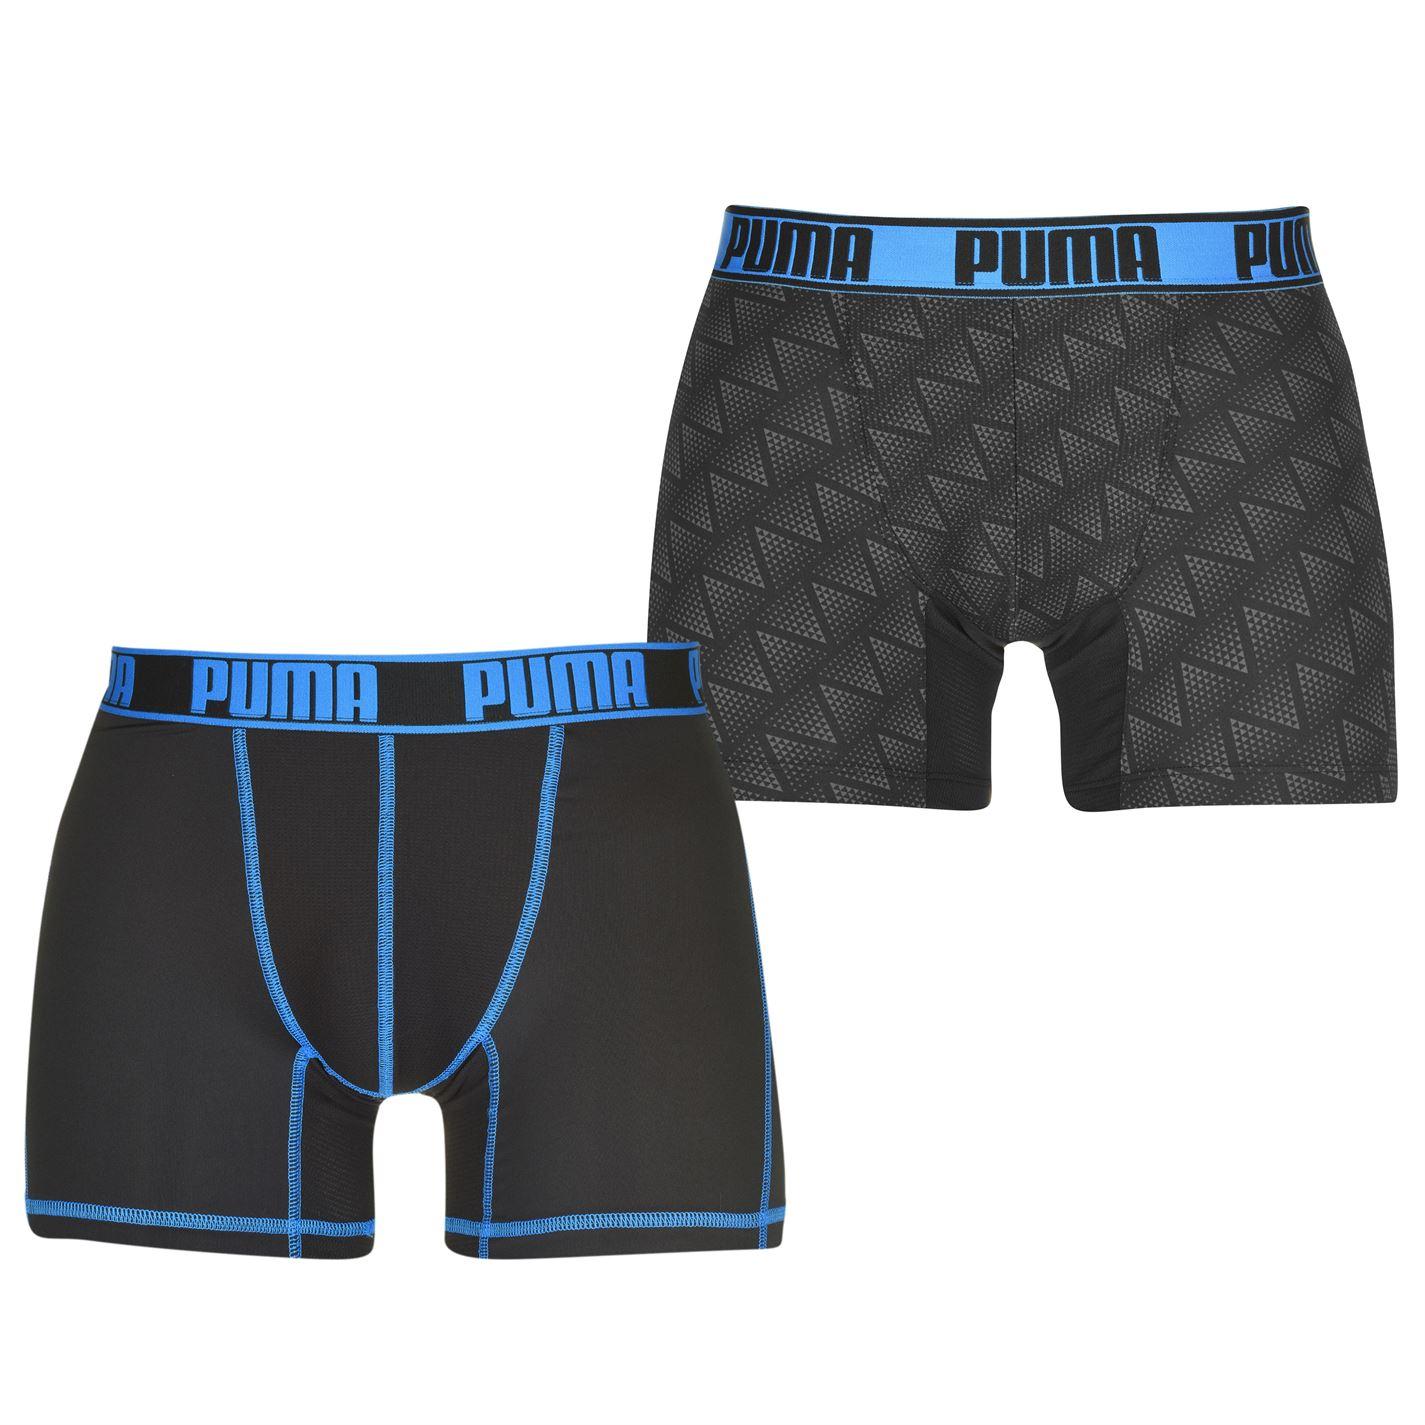 Puma 2 Pack Z Boxers Mens